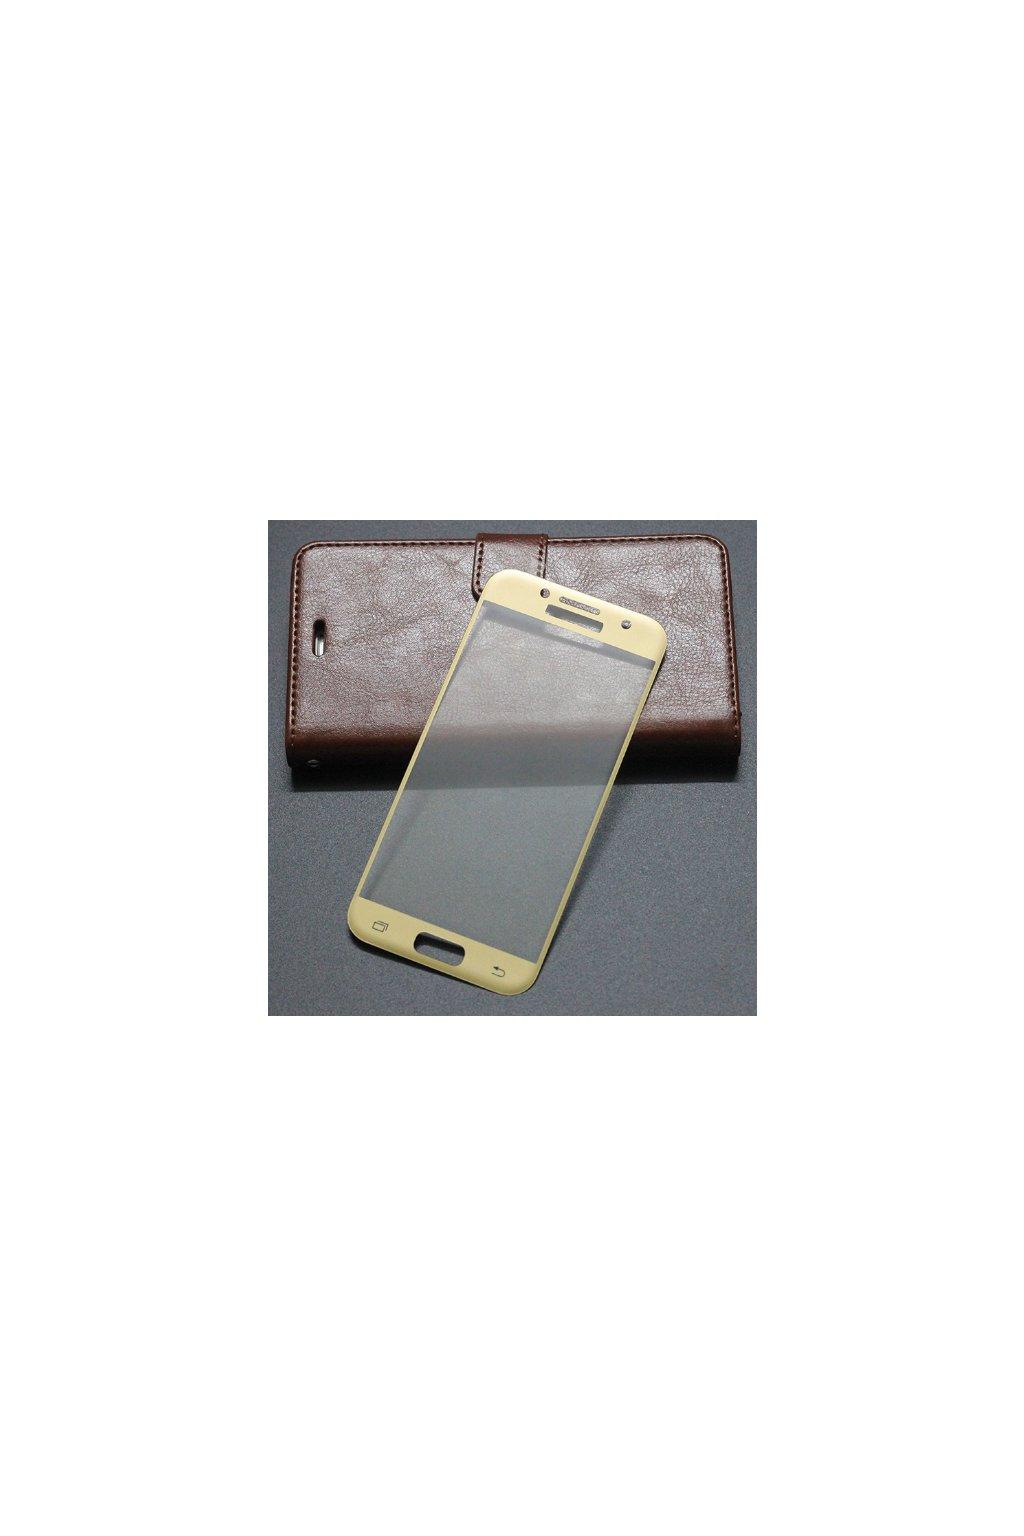 Tvrzené sklo s rámečkem na Samsung A3 2017 Zlaté